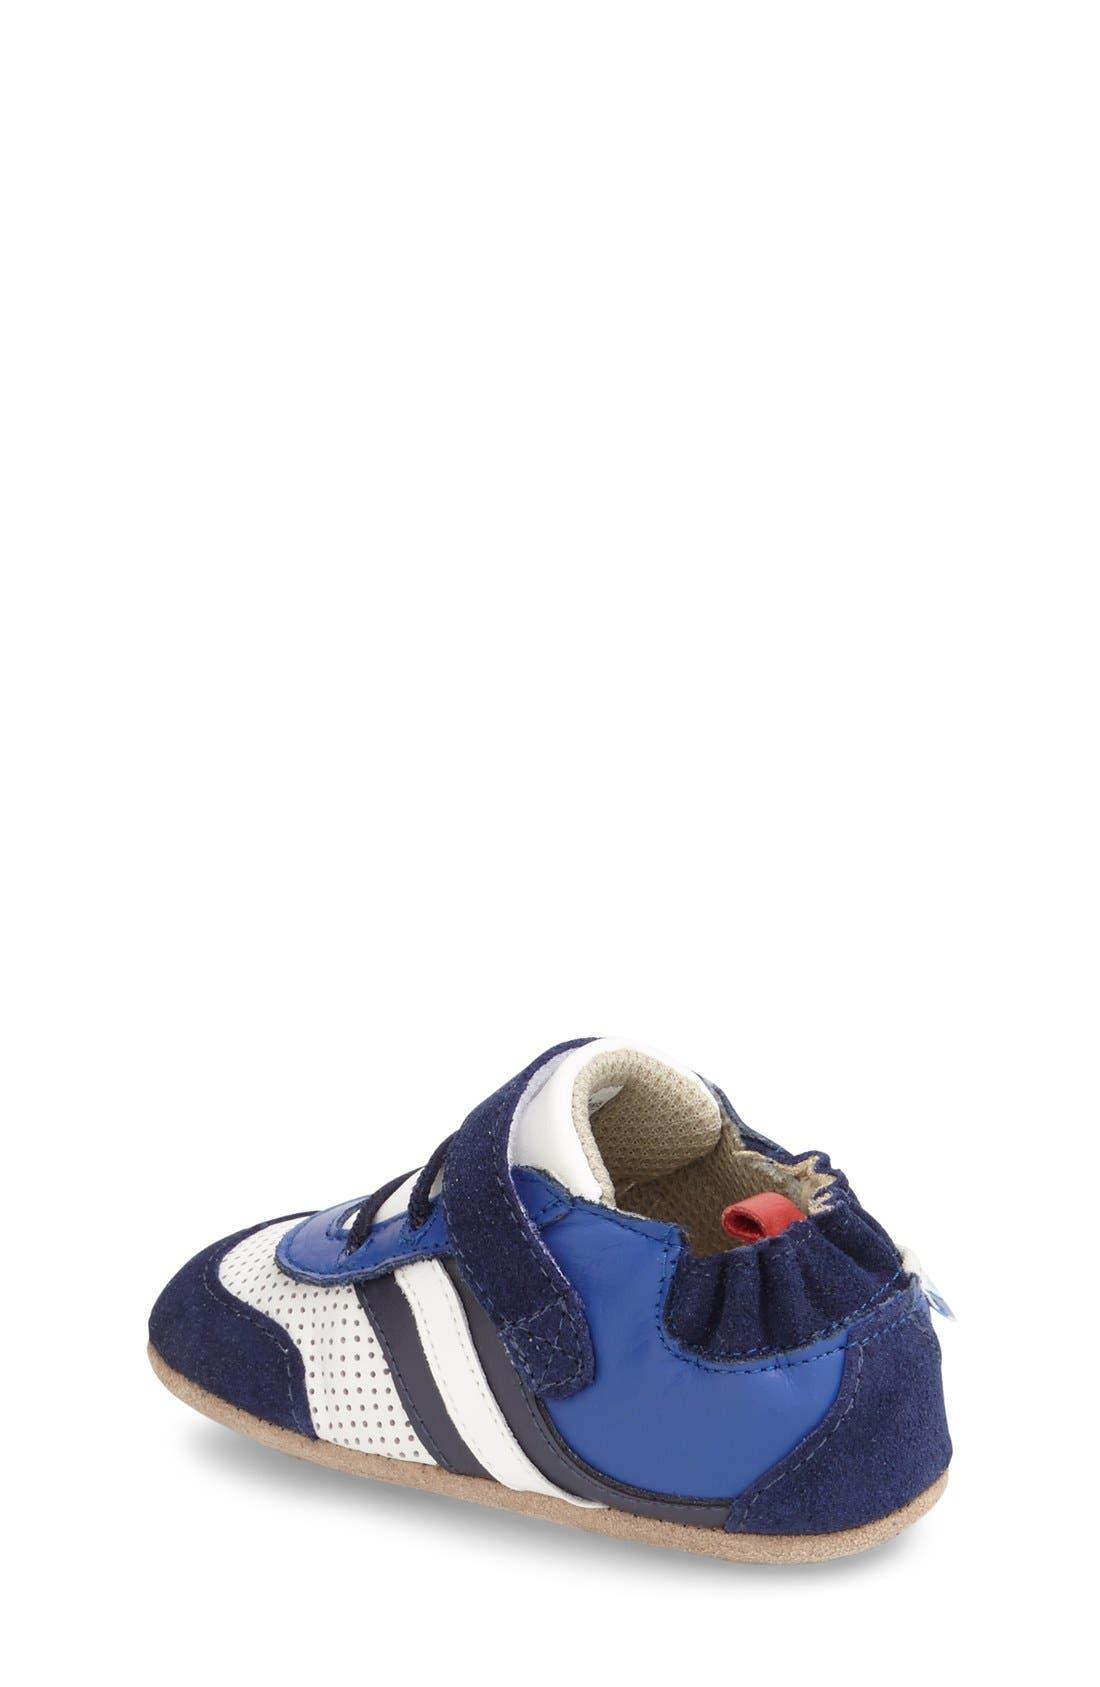 'Everyday Ethan' Crib Shoe,                             Alternate thumbnail 3, color,                             BLUE